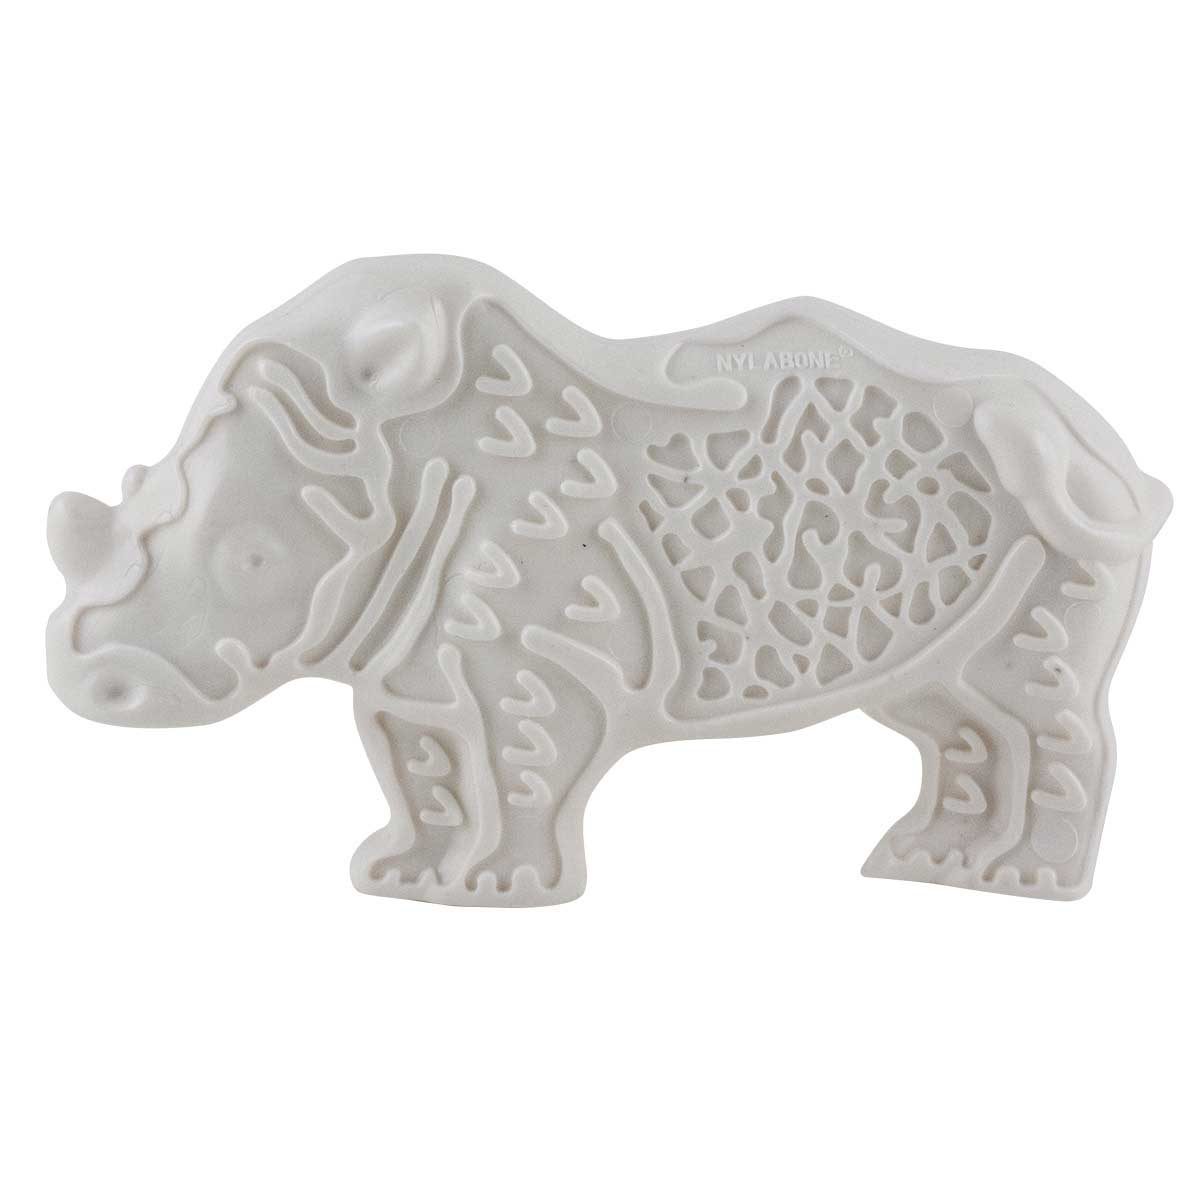 Nylabone Rhino Dental Chew for Dogs